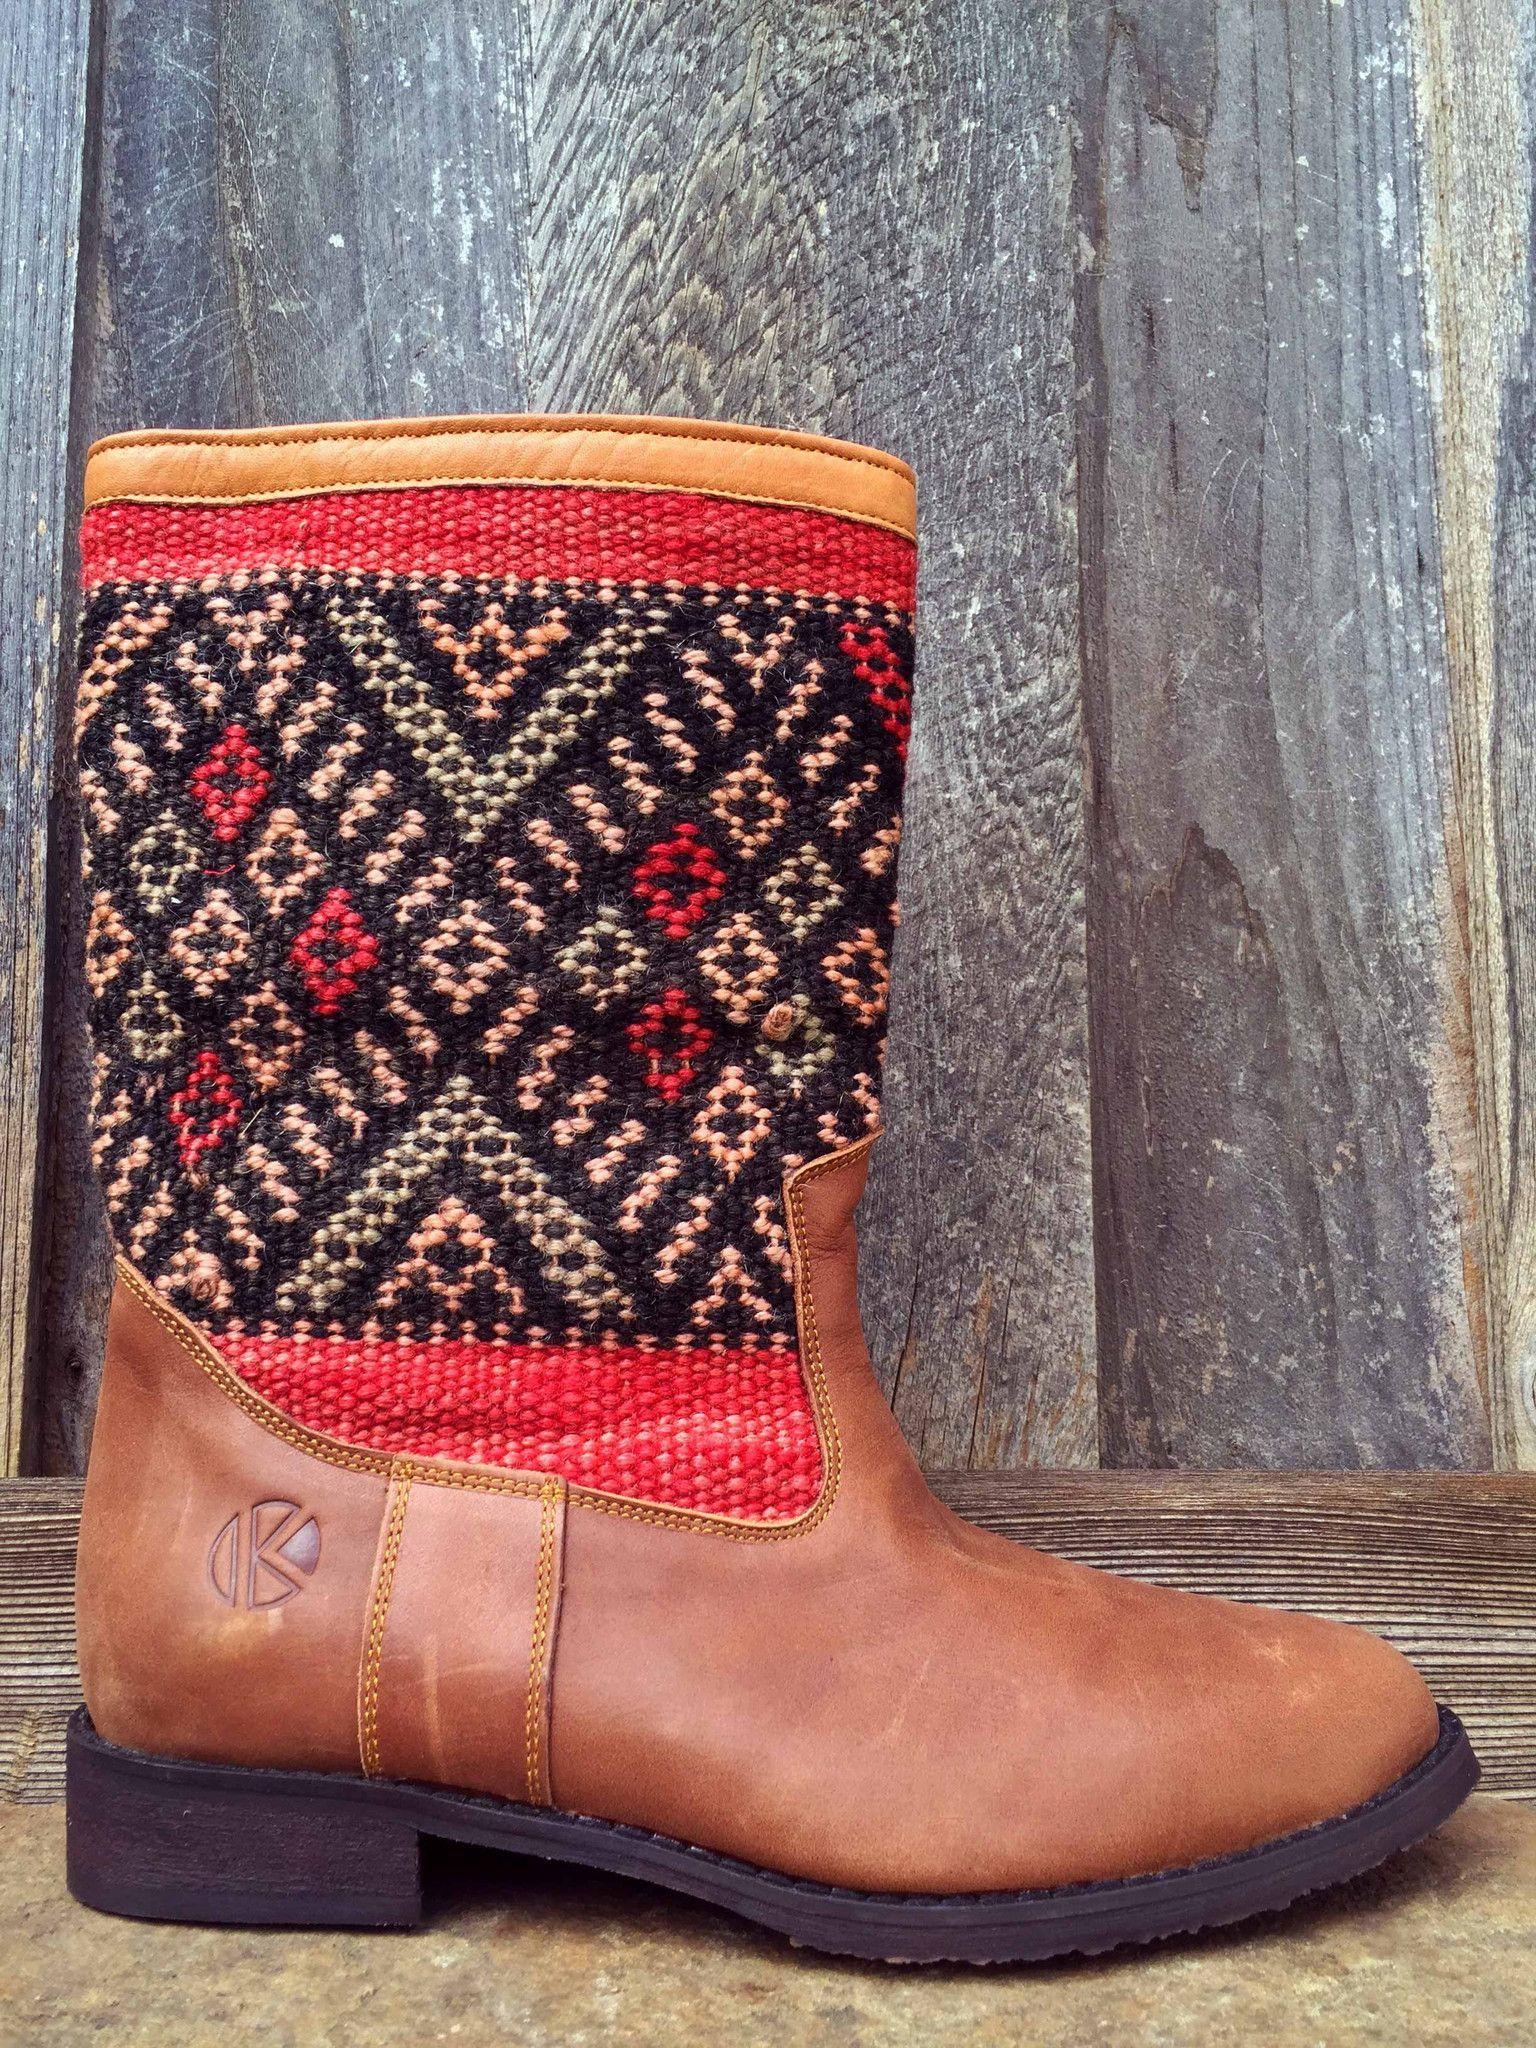 | kiboots | 'leeann' boot - size 40 {9}